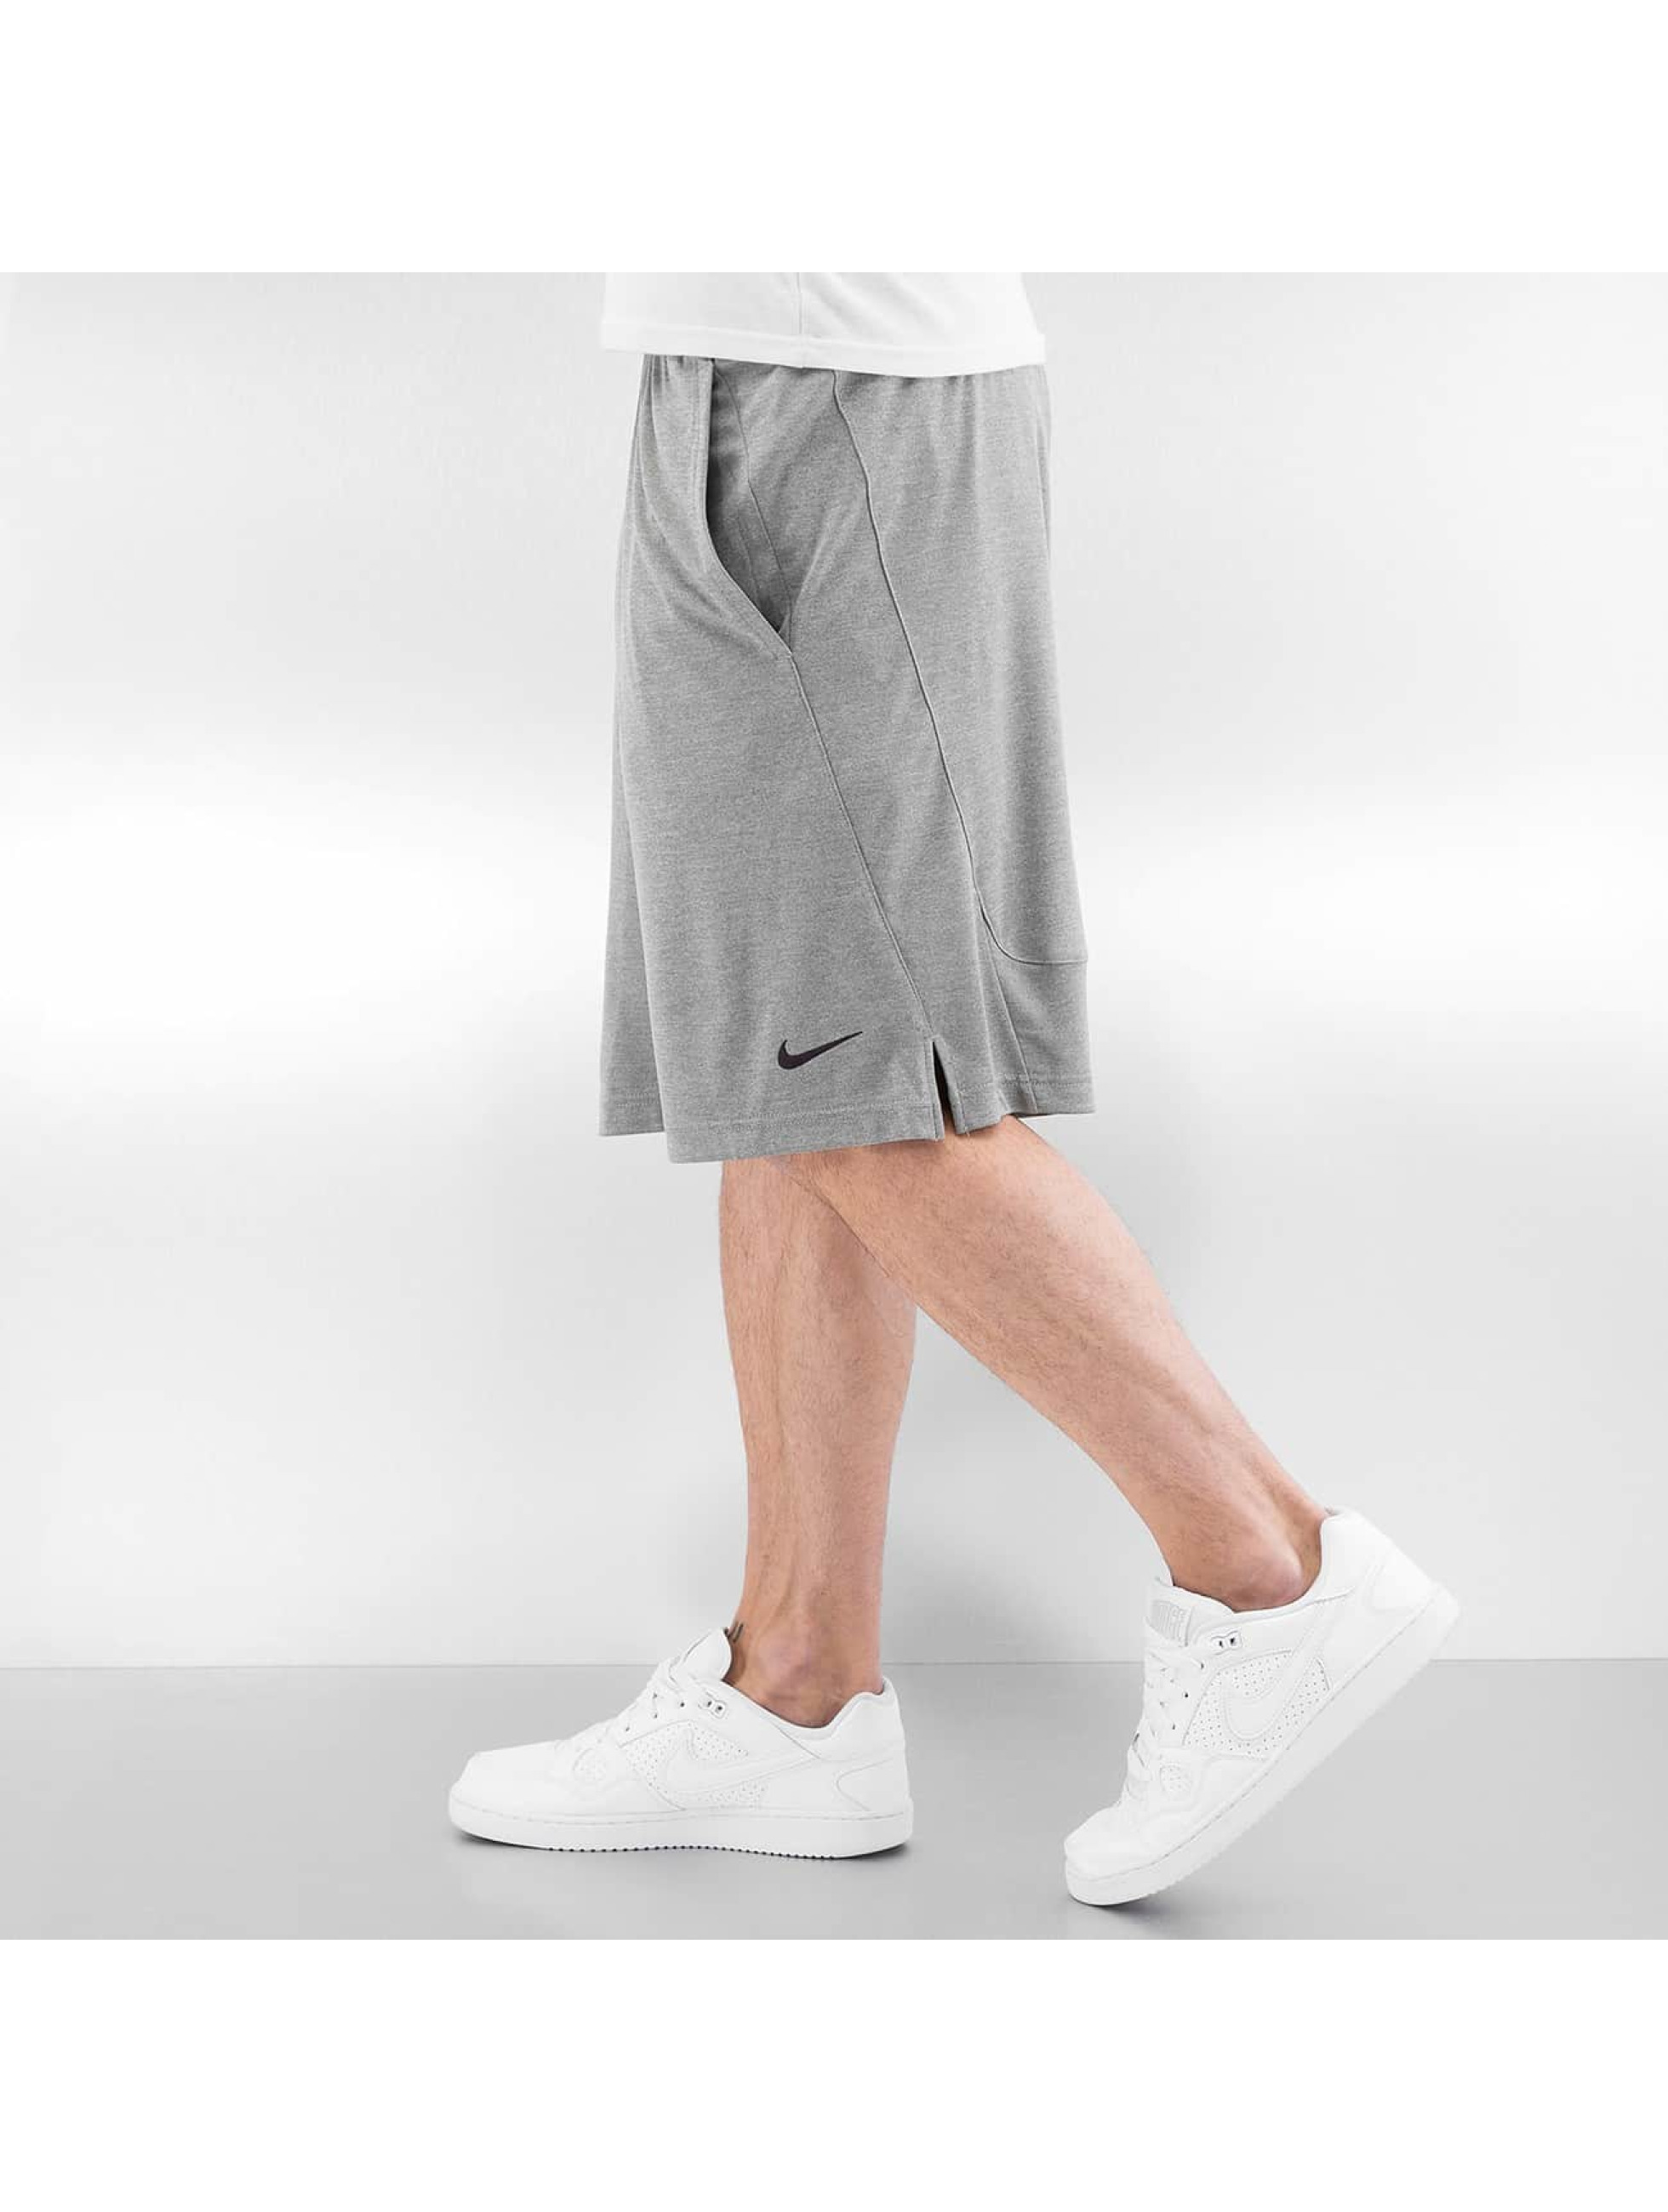 "Nike Shorts Fly 9"" grigio"